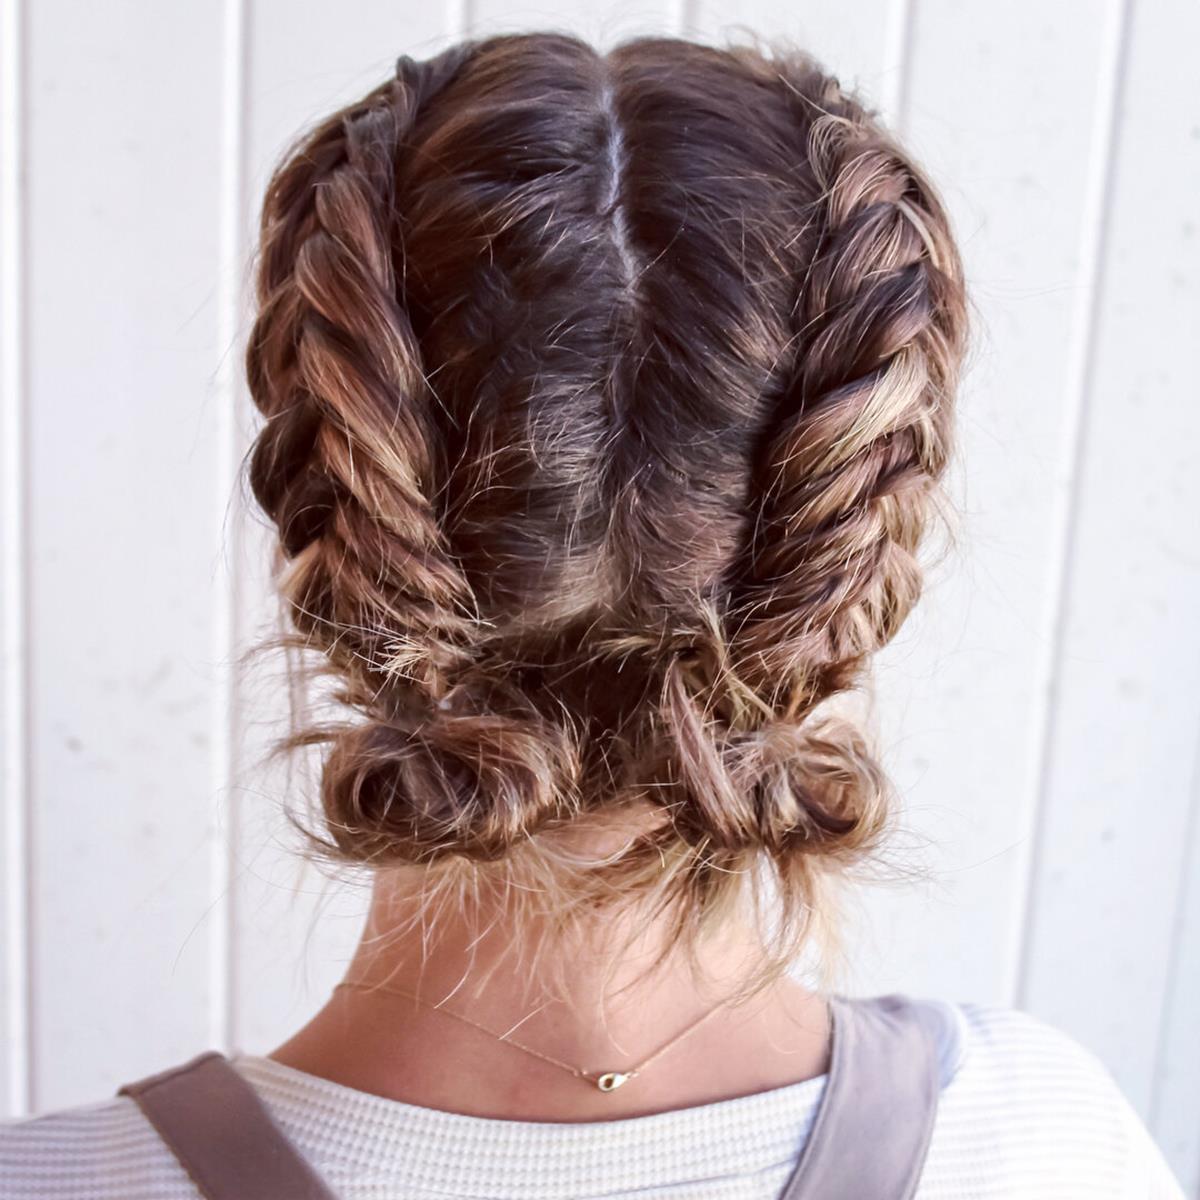 Peinados Pelo Corto Mujer Los Mas De Moda Primavera Verano 2019